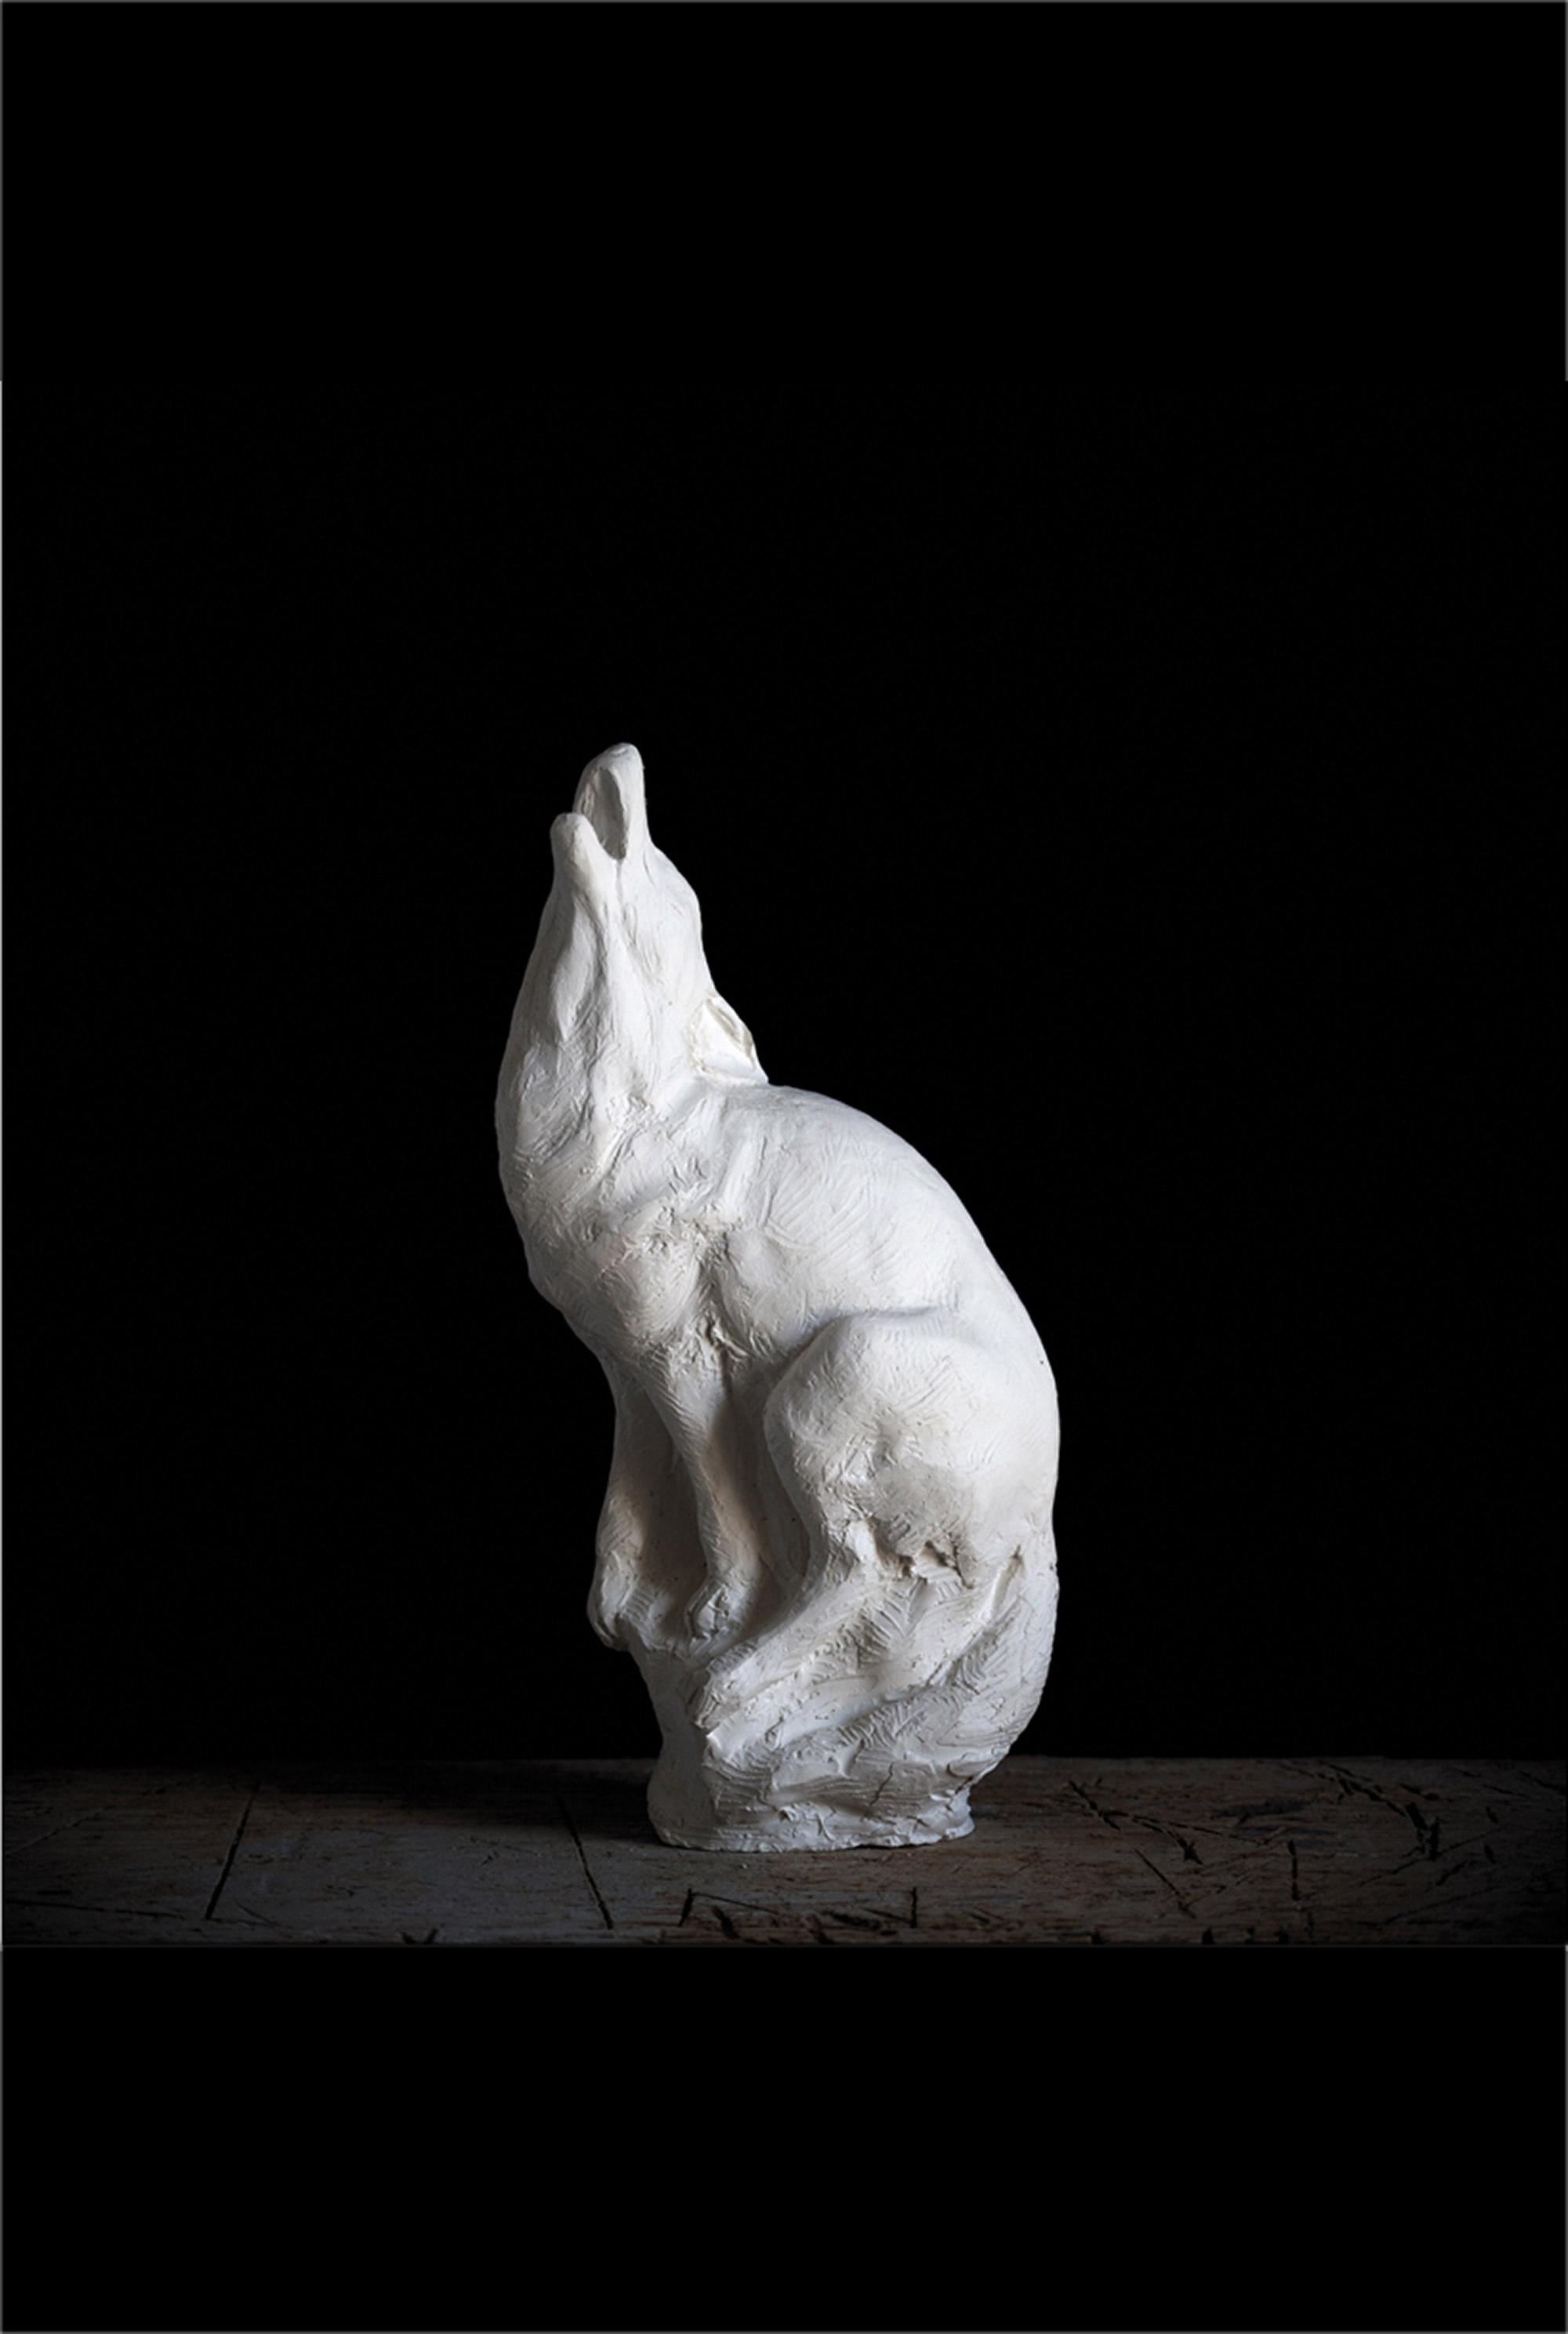 New-York-Academy-of-Art-Carrara-Residency-Heather-Personett-Zoe-Suenson-Taylor20171213_0057.jpg